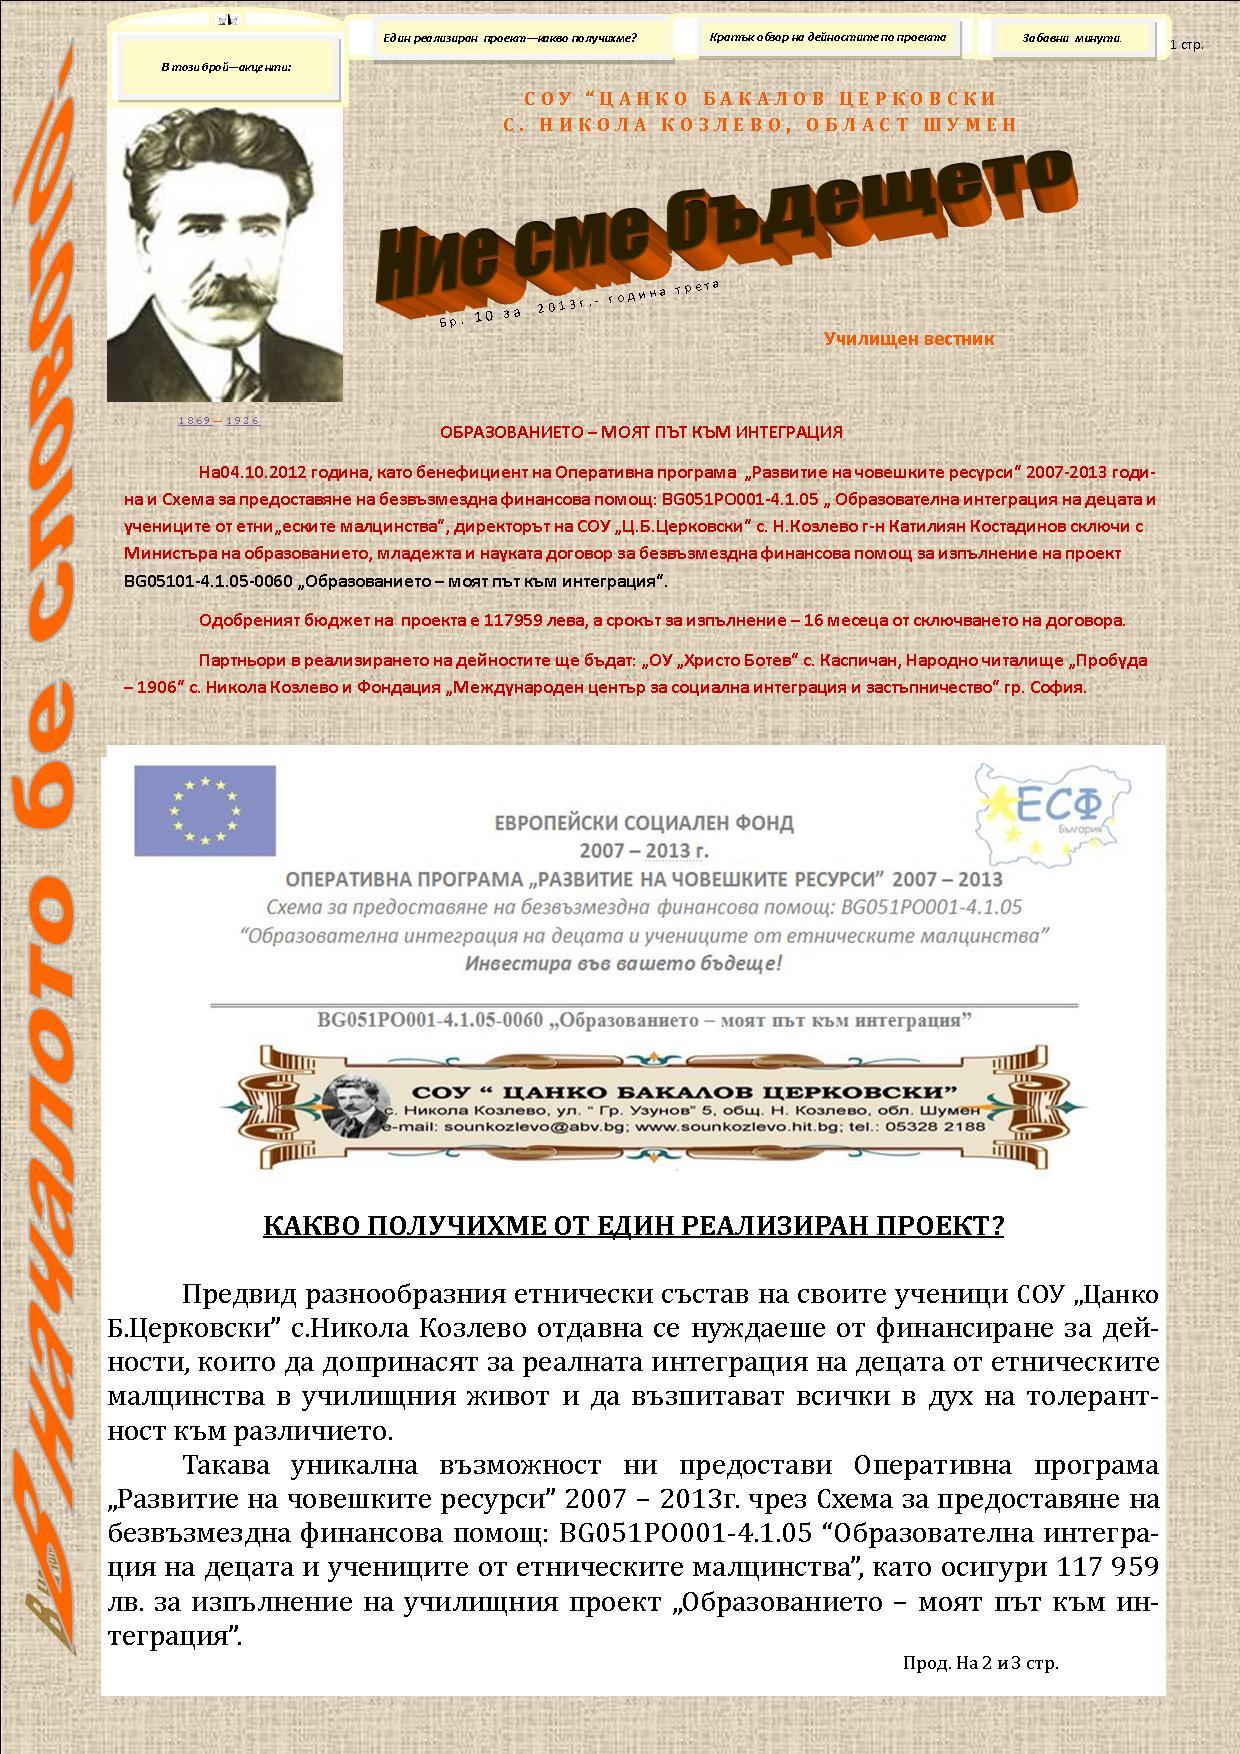 1вестник-10-ти бр-октомври-стр1 за 2013